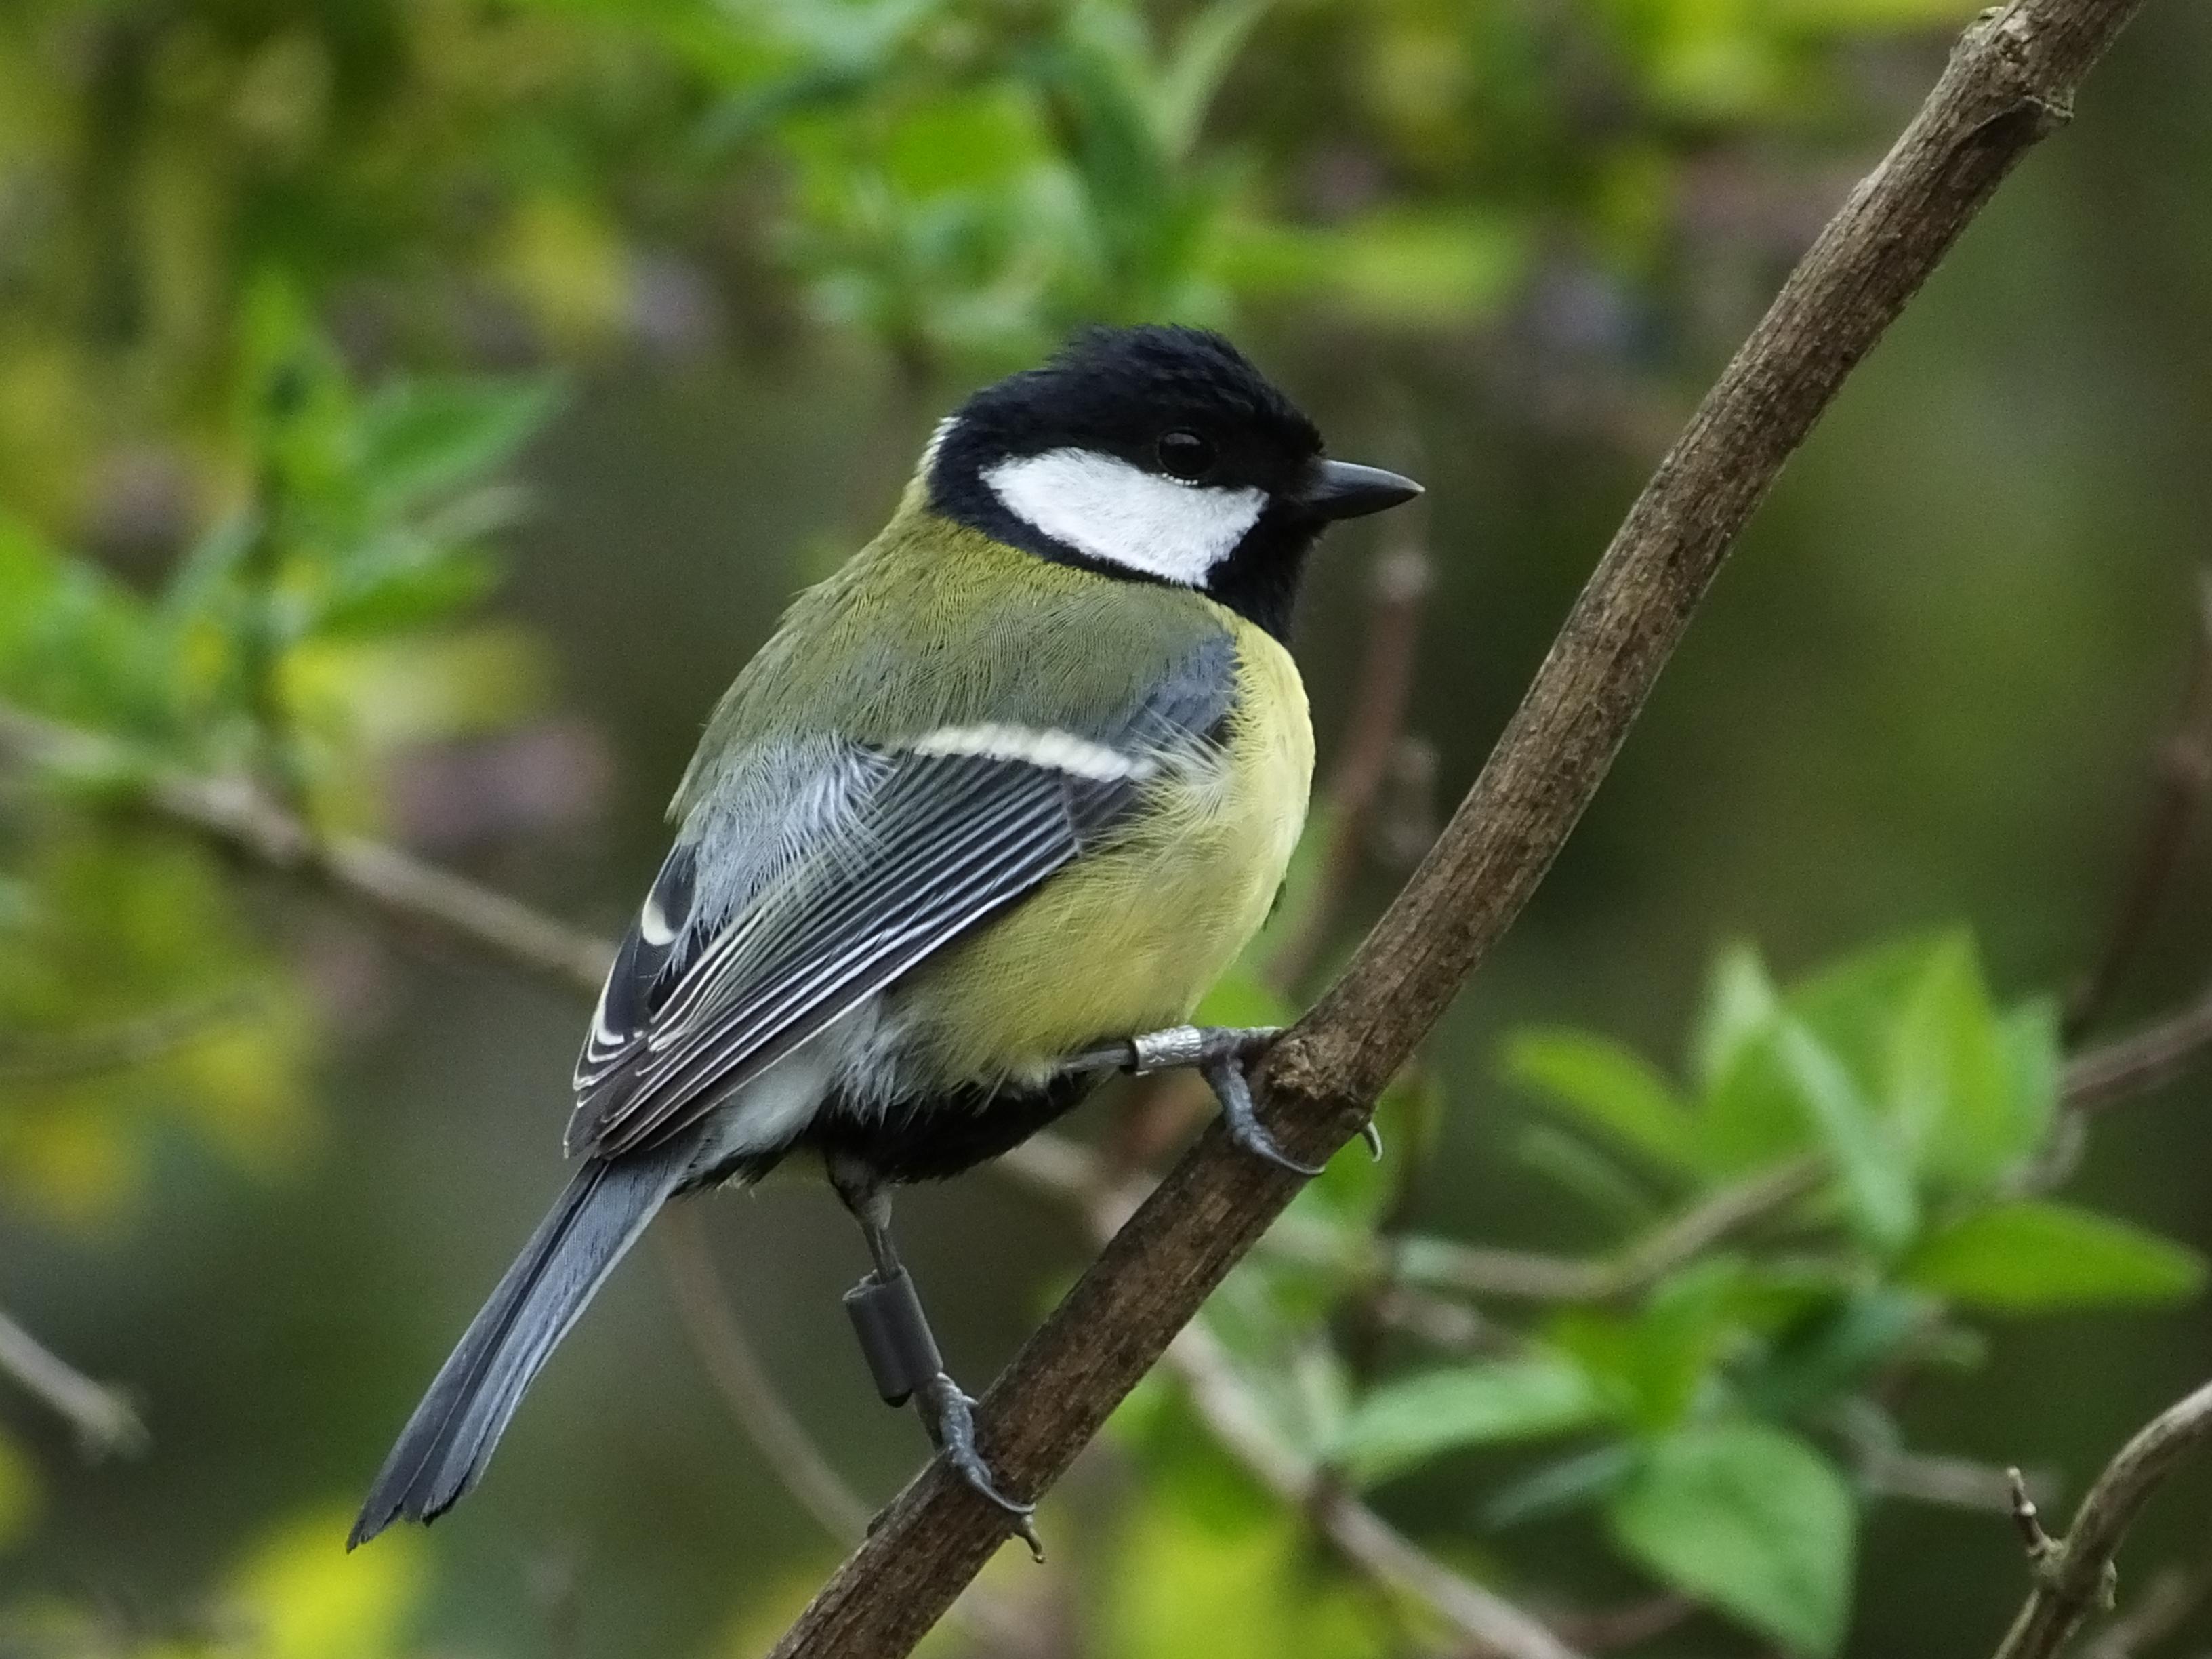 Birds choose spring neighbours based on winter 'friendships'